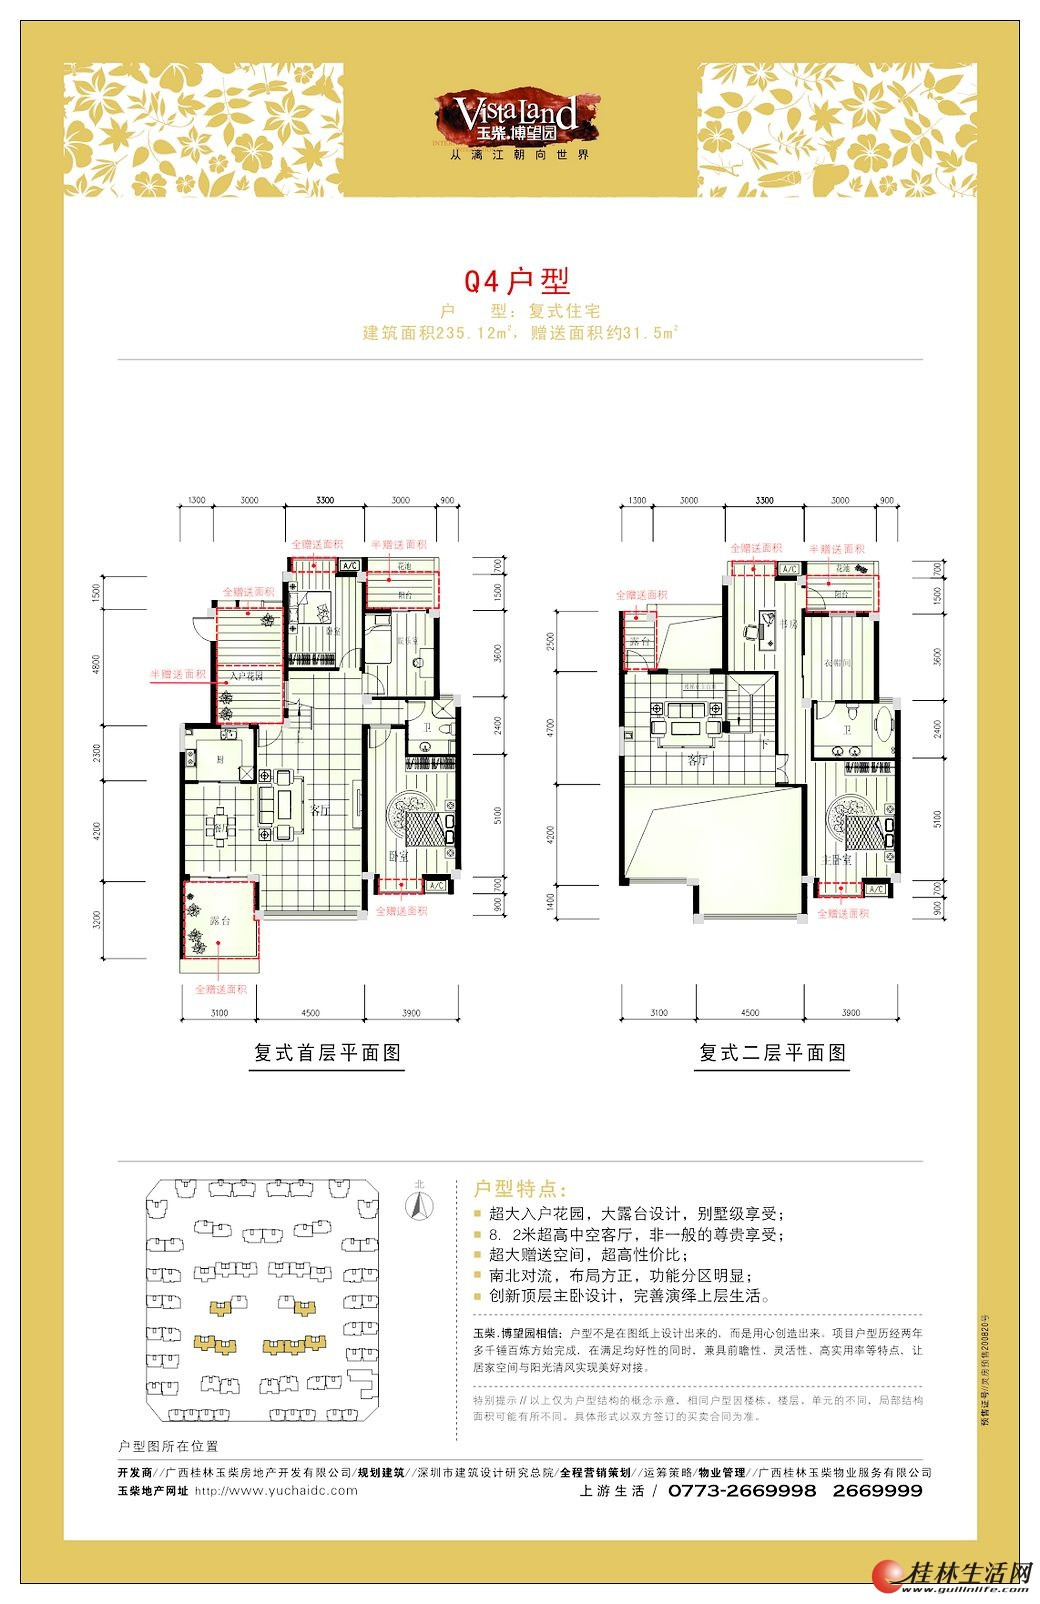 Q4户型 复式住宅 235.12㎡